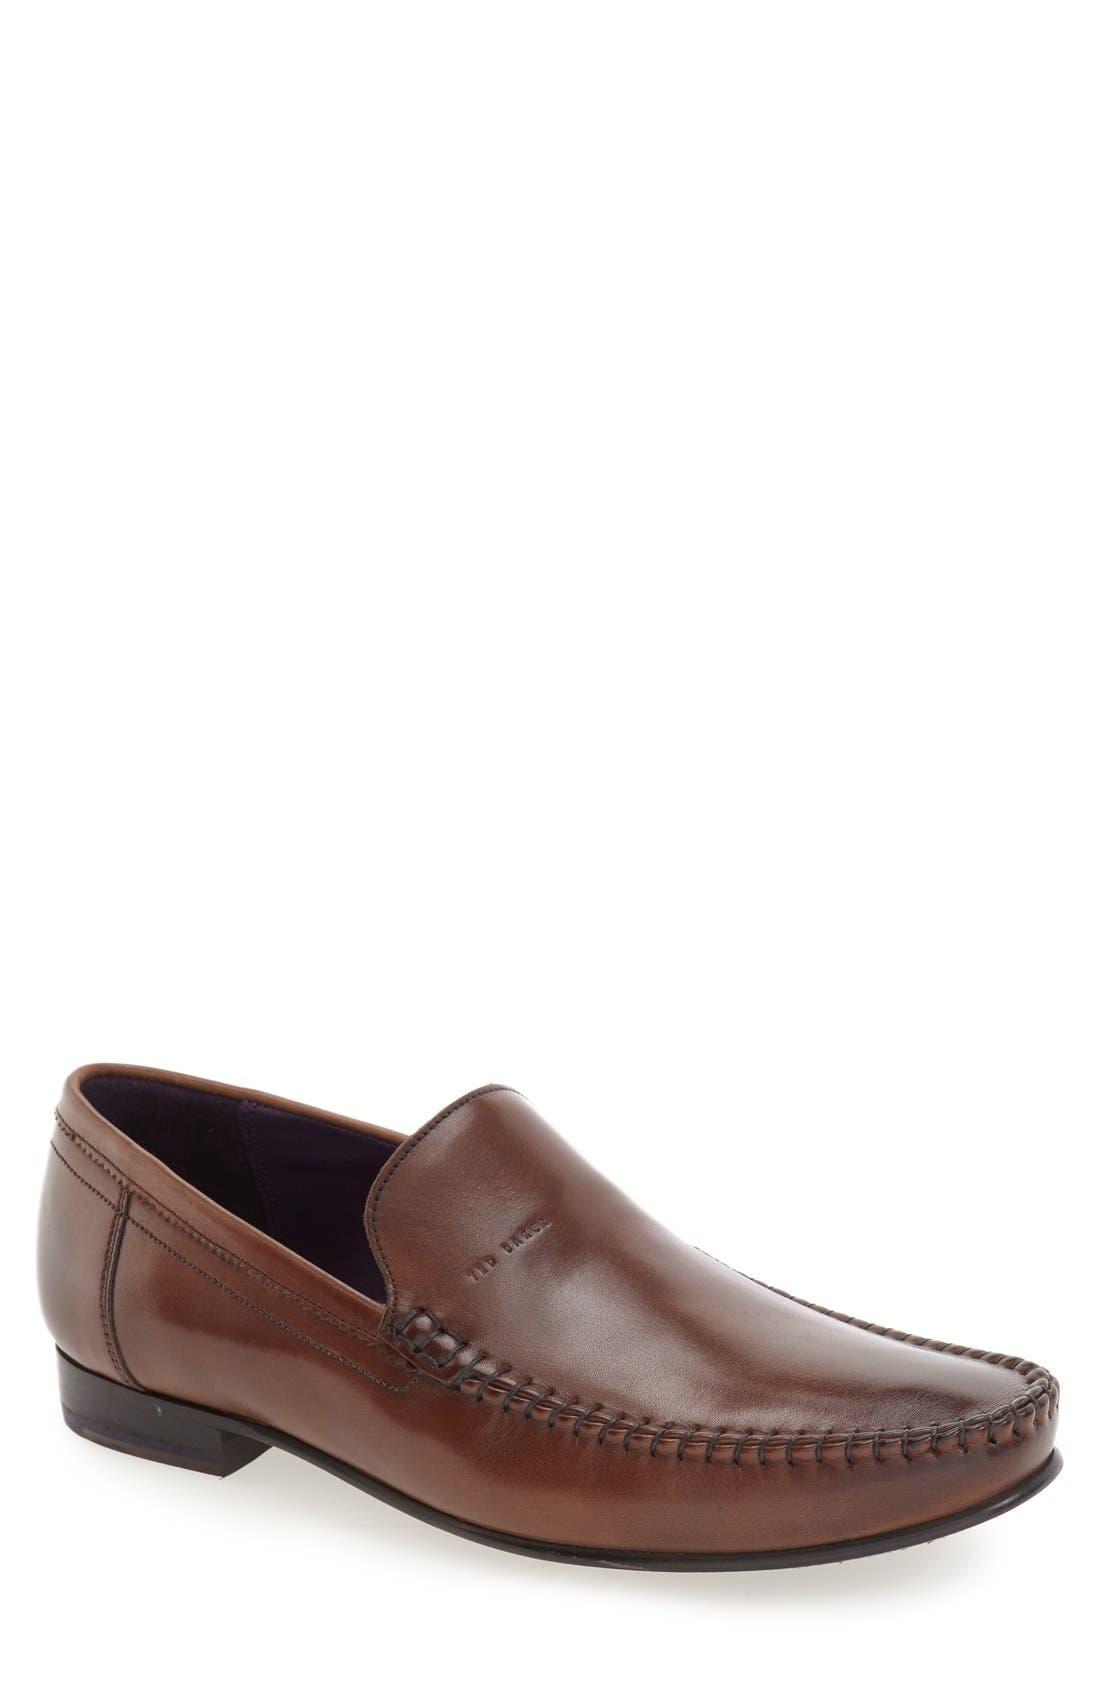 'Simeen 3' Venetian Loafer,                         Main,                         color, Brown